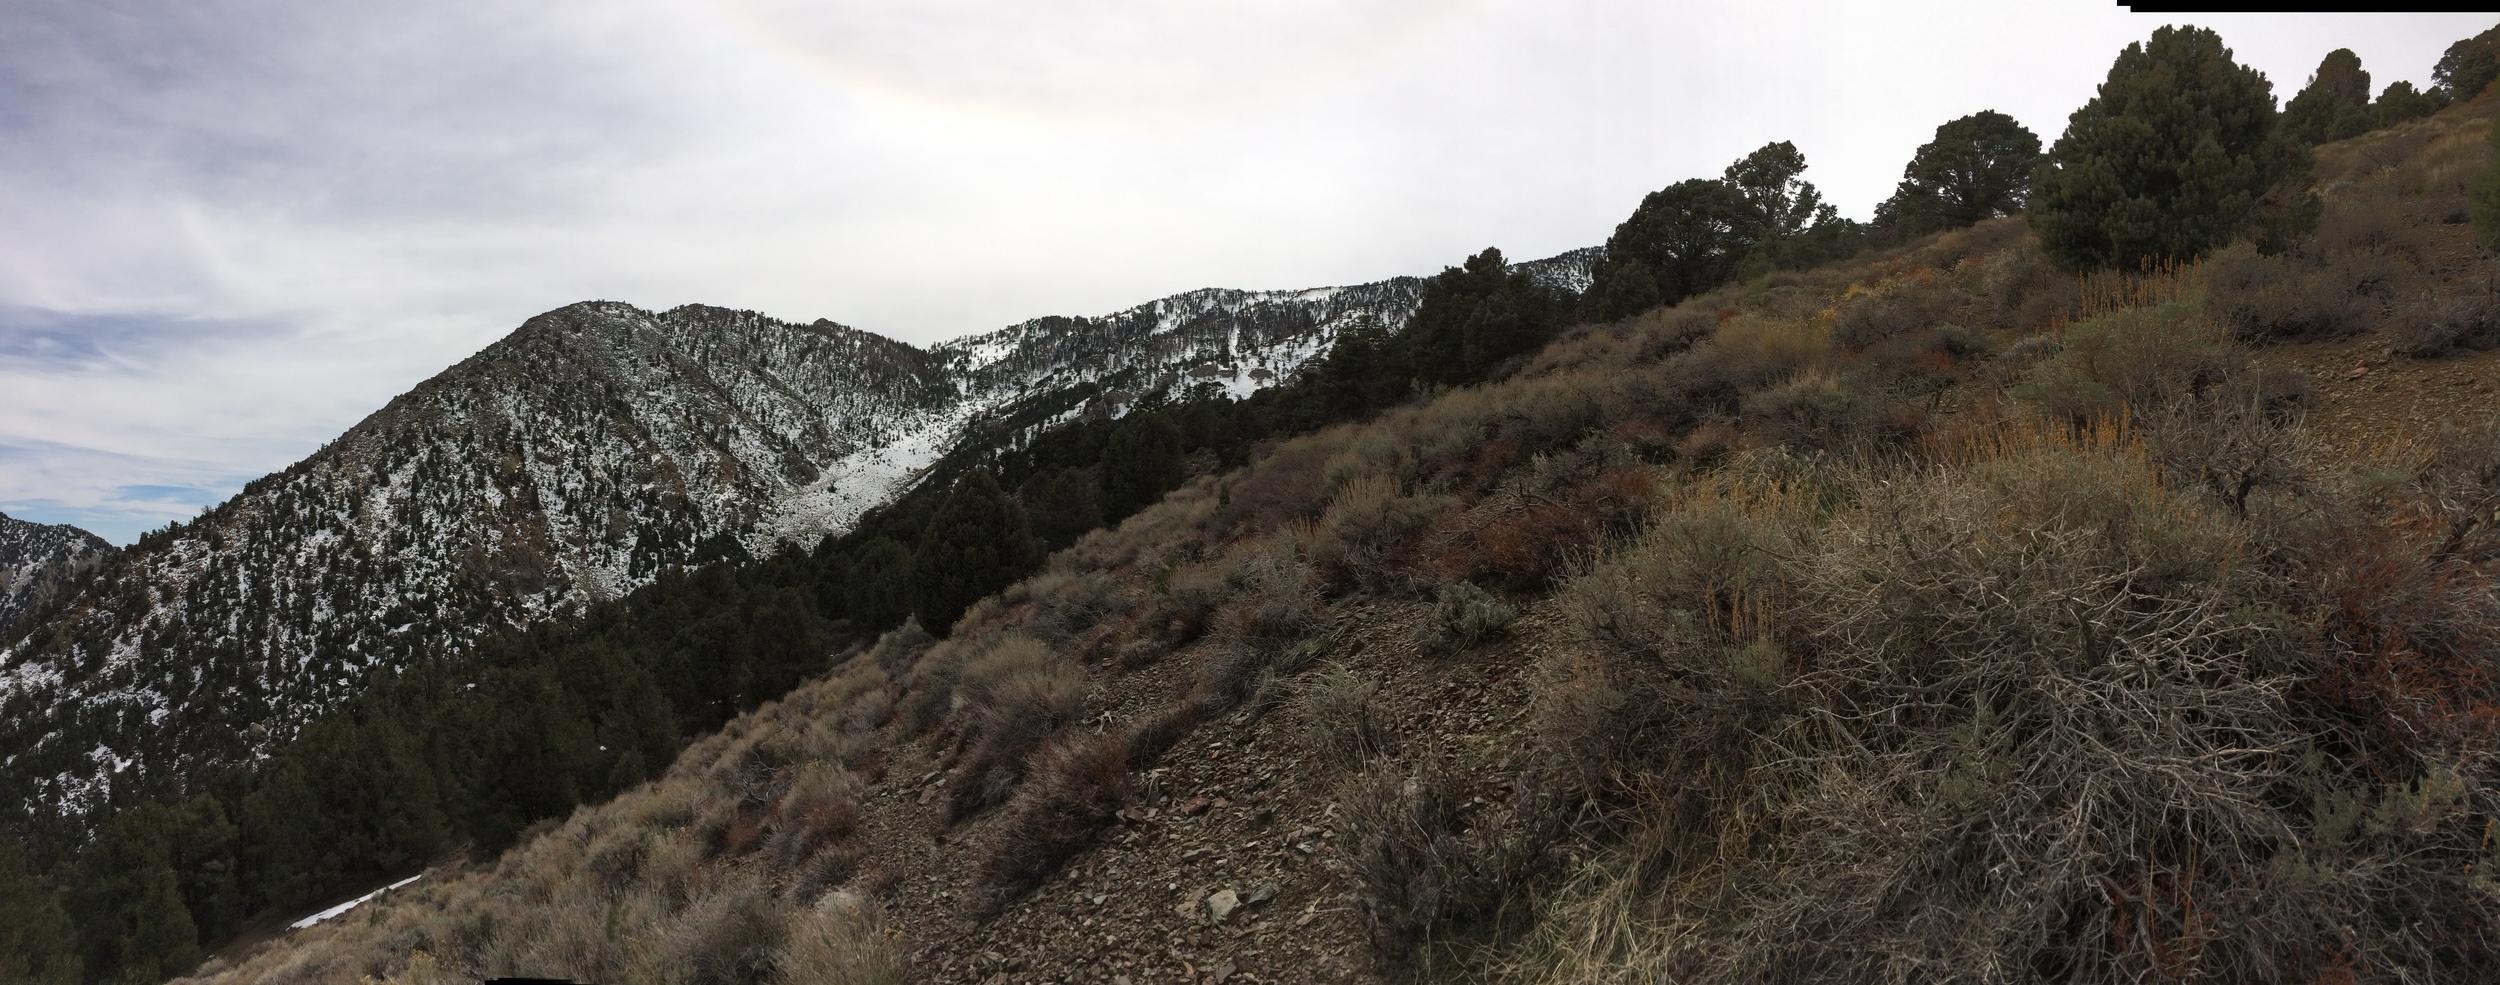 Panamint Range, Death Valley National Park, March 2015